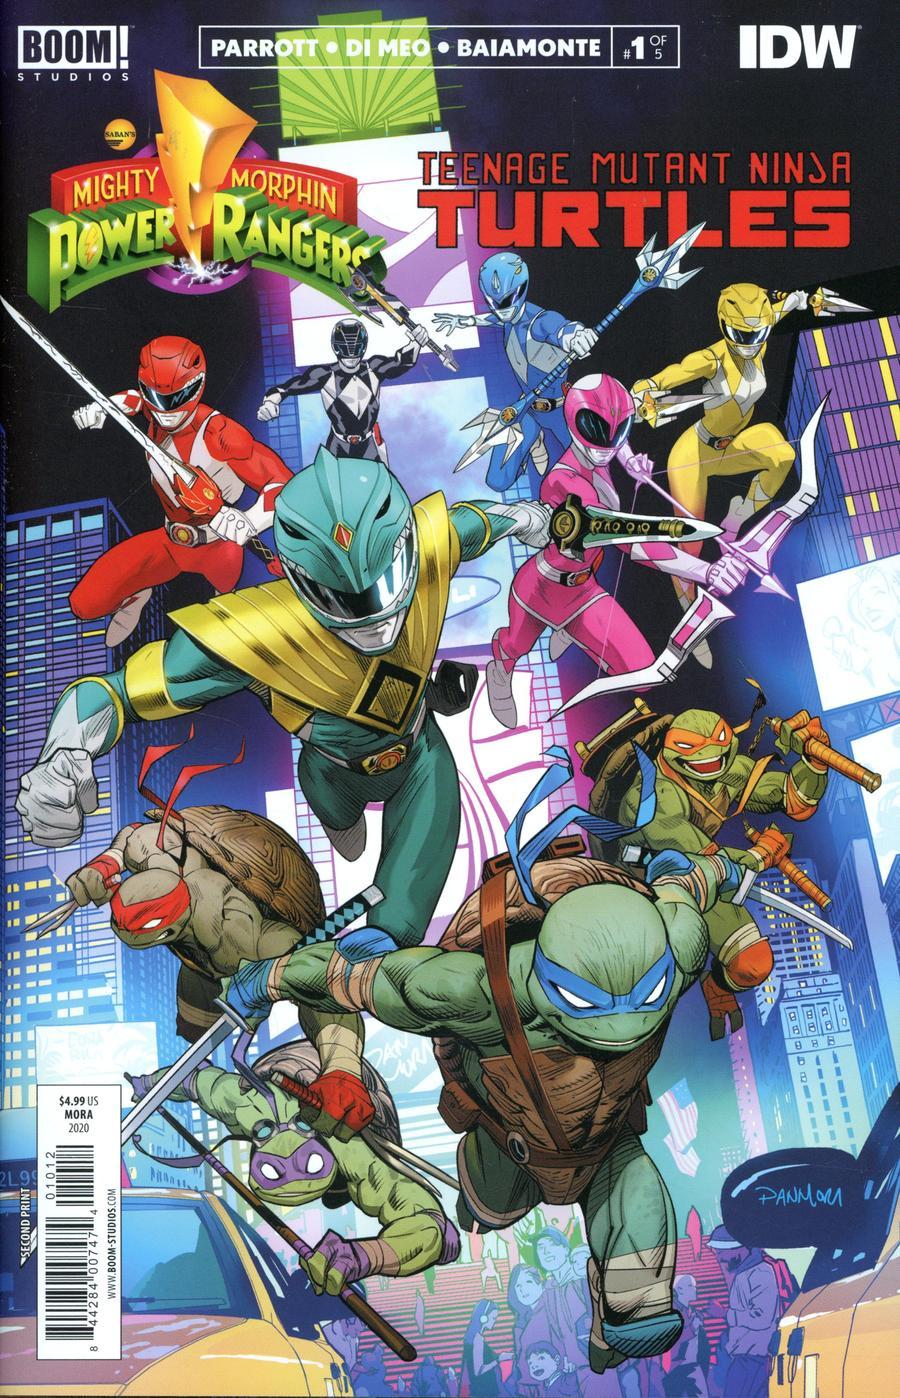 Mighty Morphin Power Rangers Teenage Mutant Ninja Turtles #1 Cover K 2nd Ptg Regular Dan Mora Cover